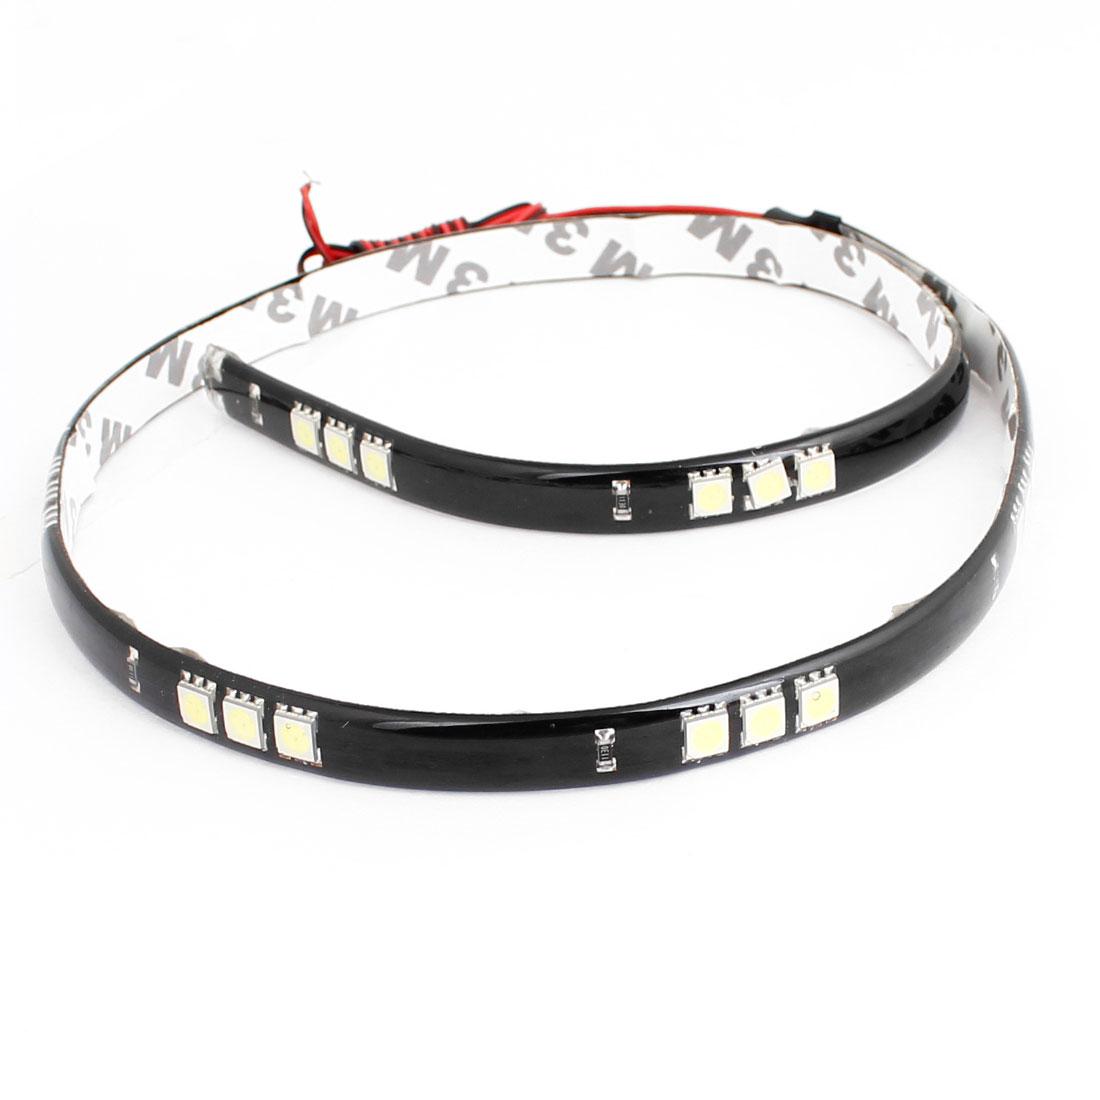 Truck Car White 5050 SMD 30 LEDs 60cm Decorative LED Lamp Strip